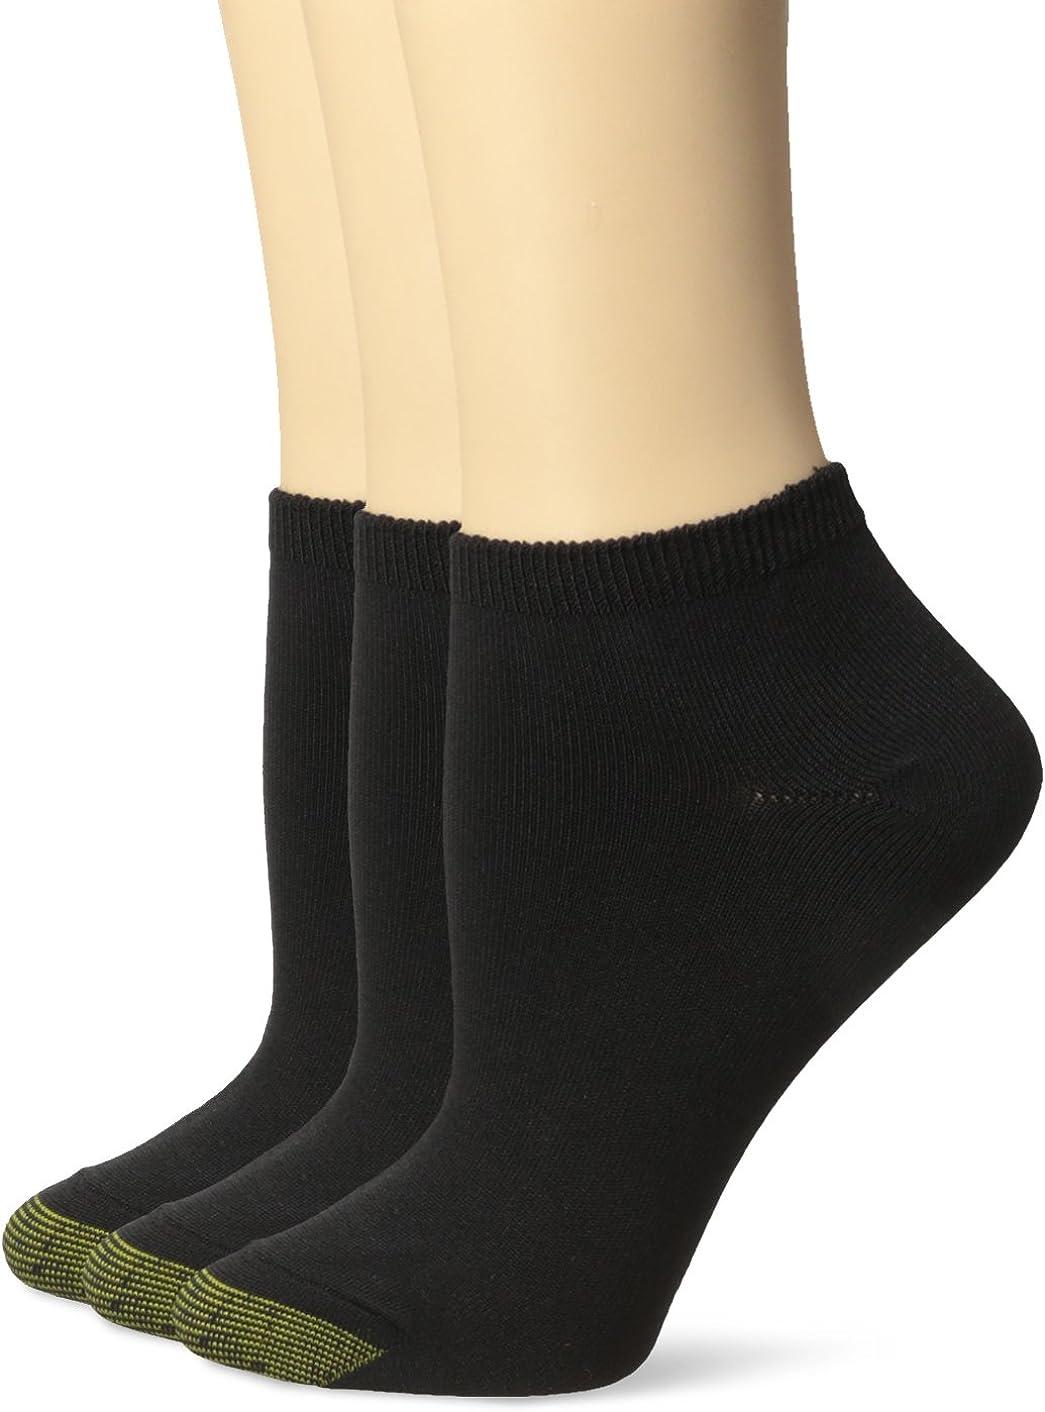 Gold Toe Women's Ultra Soft Le Grand No Show Socks, 3-Pairs